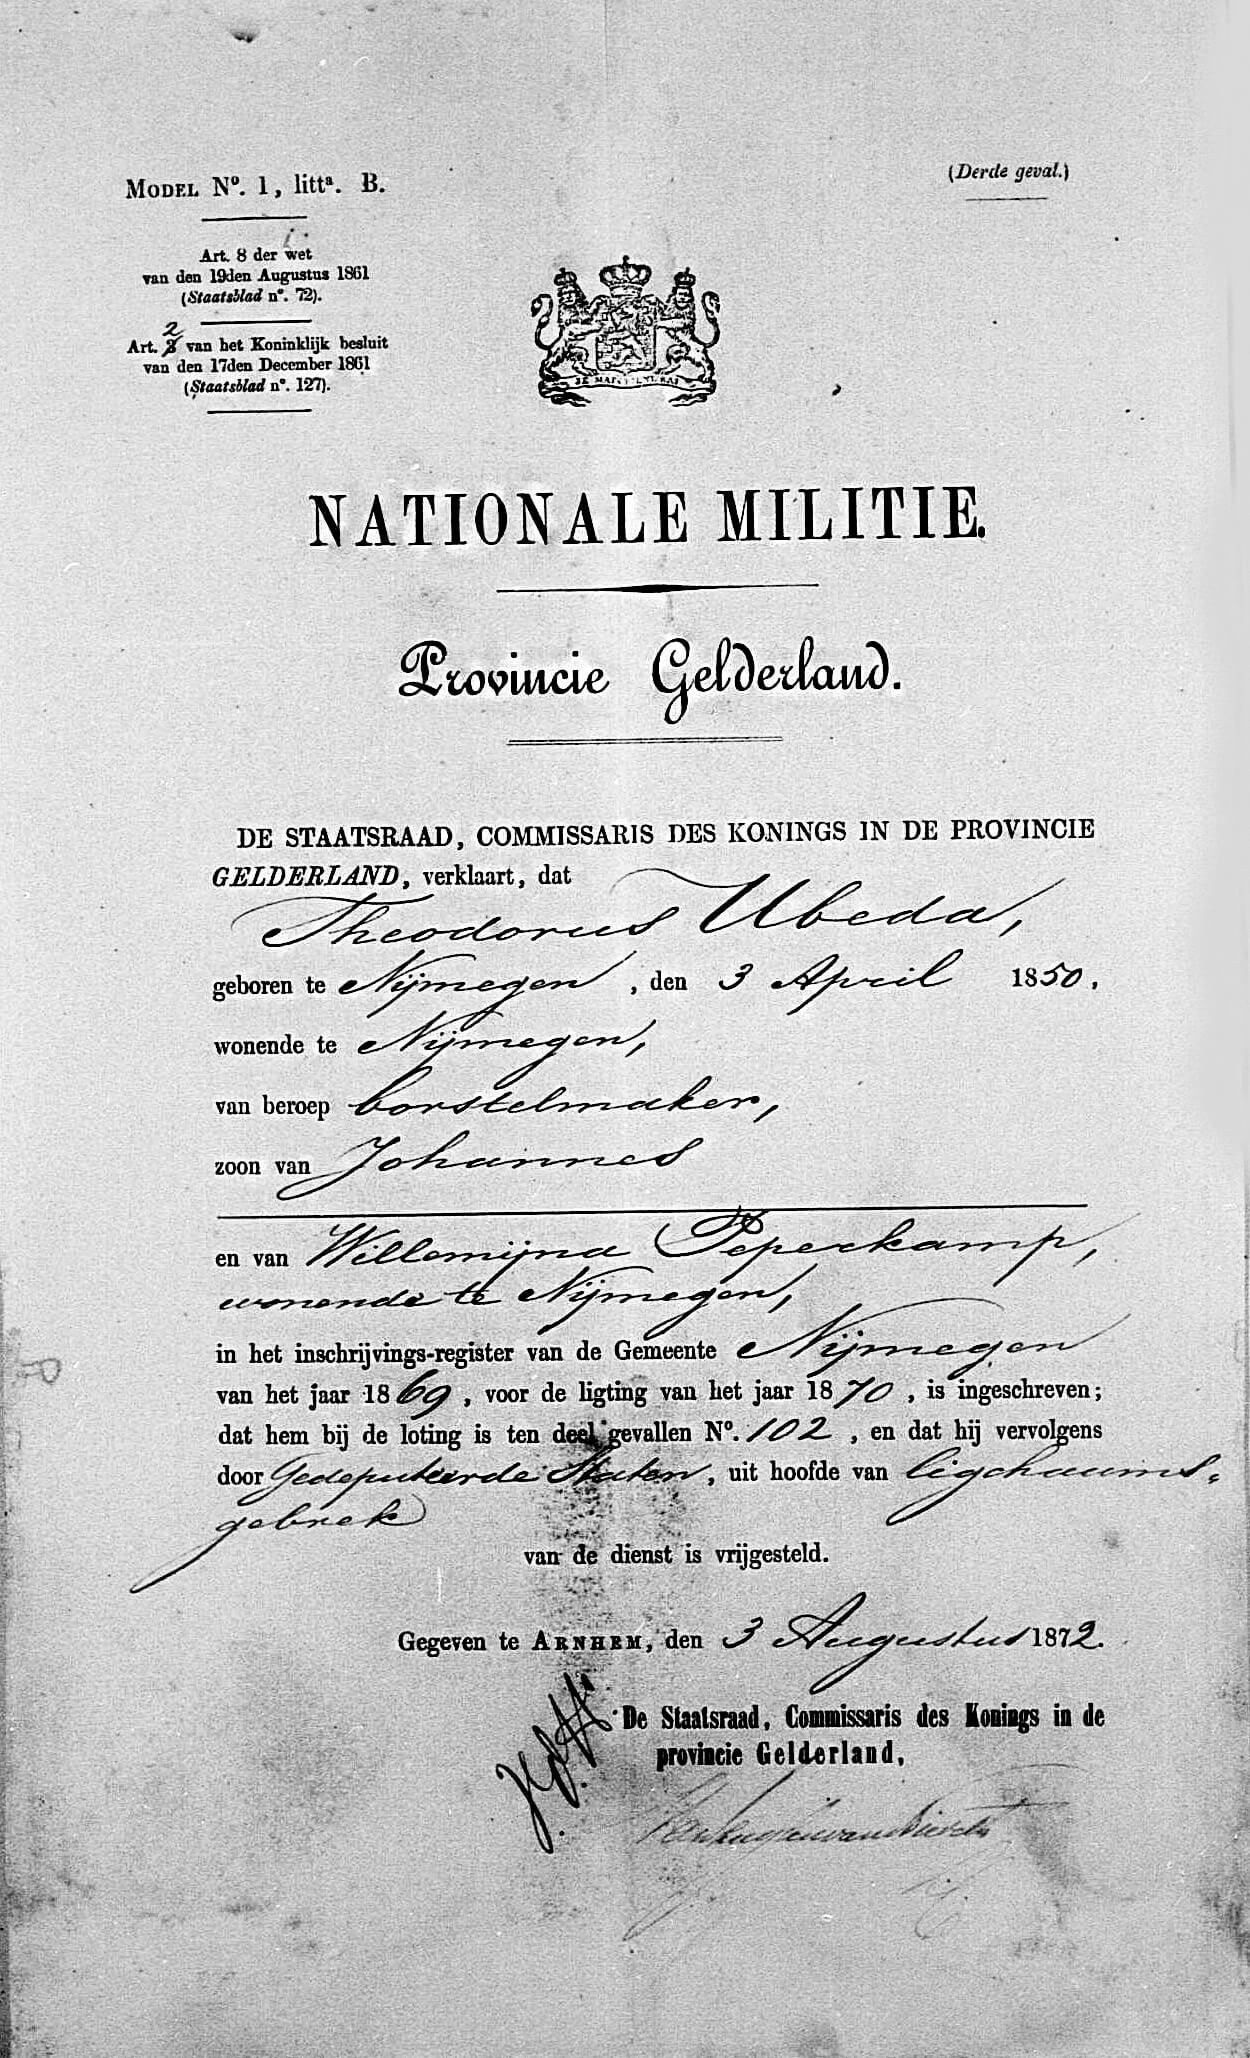 Nationale Militie Theodorus Ubeda